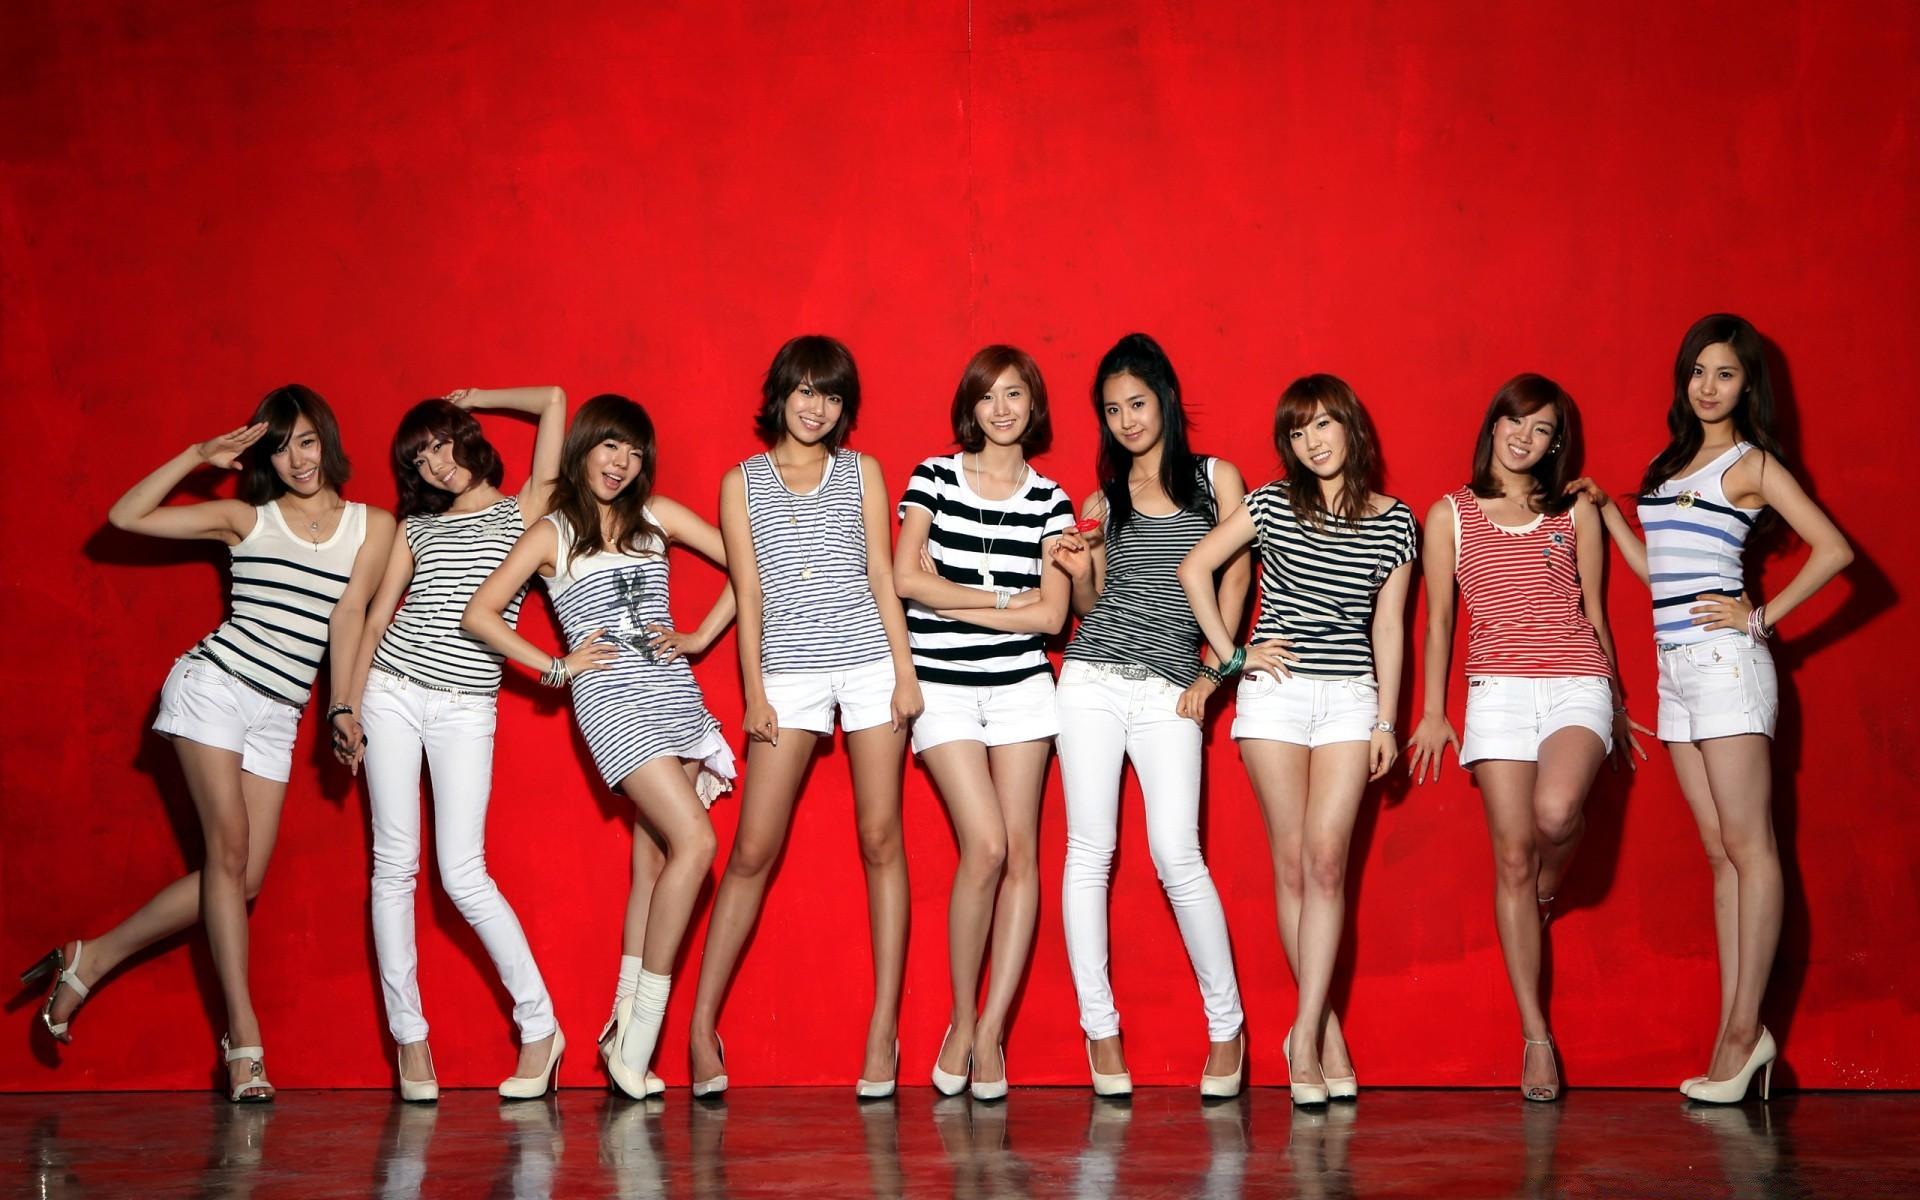 Music Woman Fashion Girl Portrait Model Stage Adult - Girls Generation Wallpaper Hd - HD Wallpaper